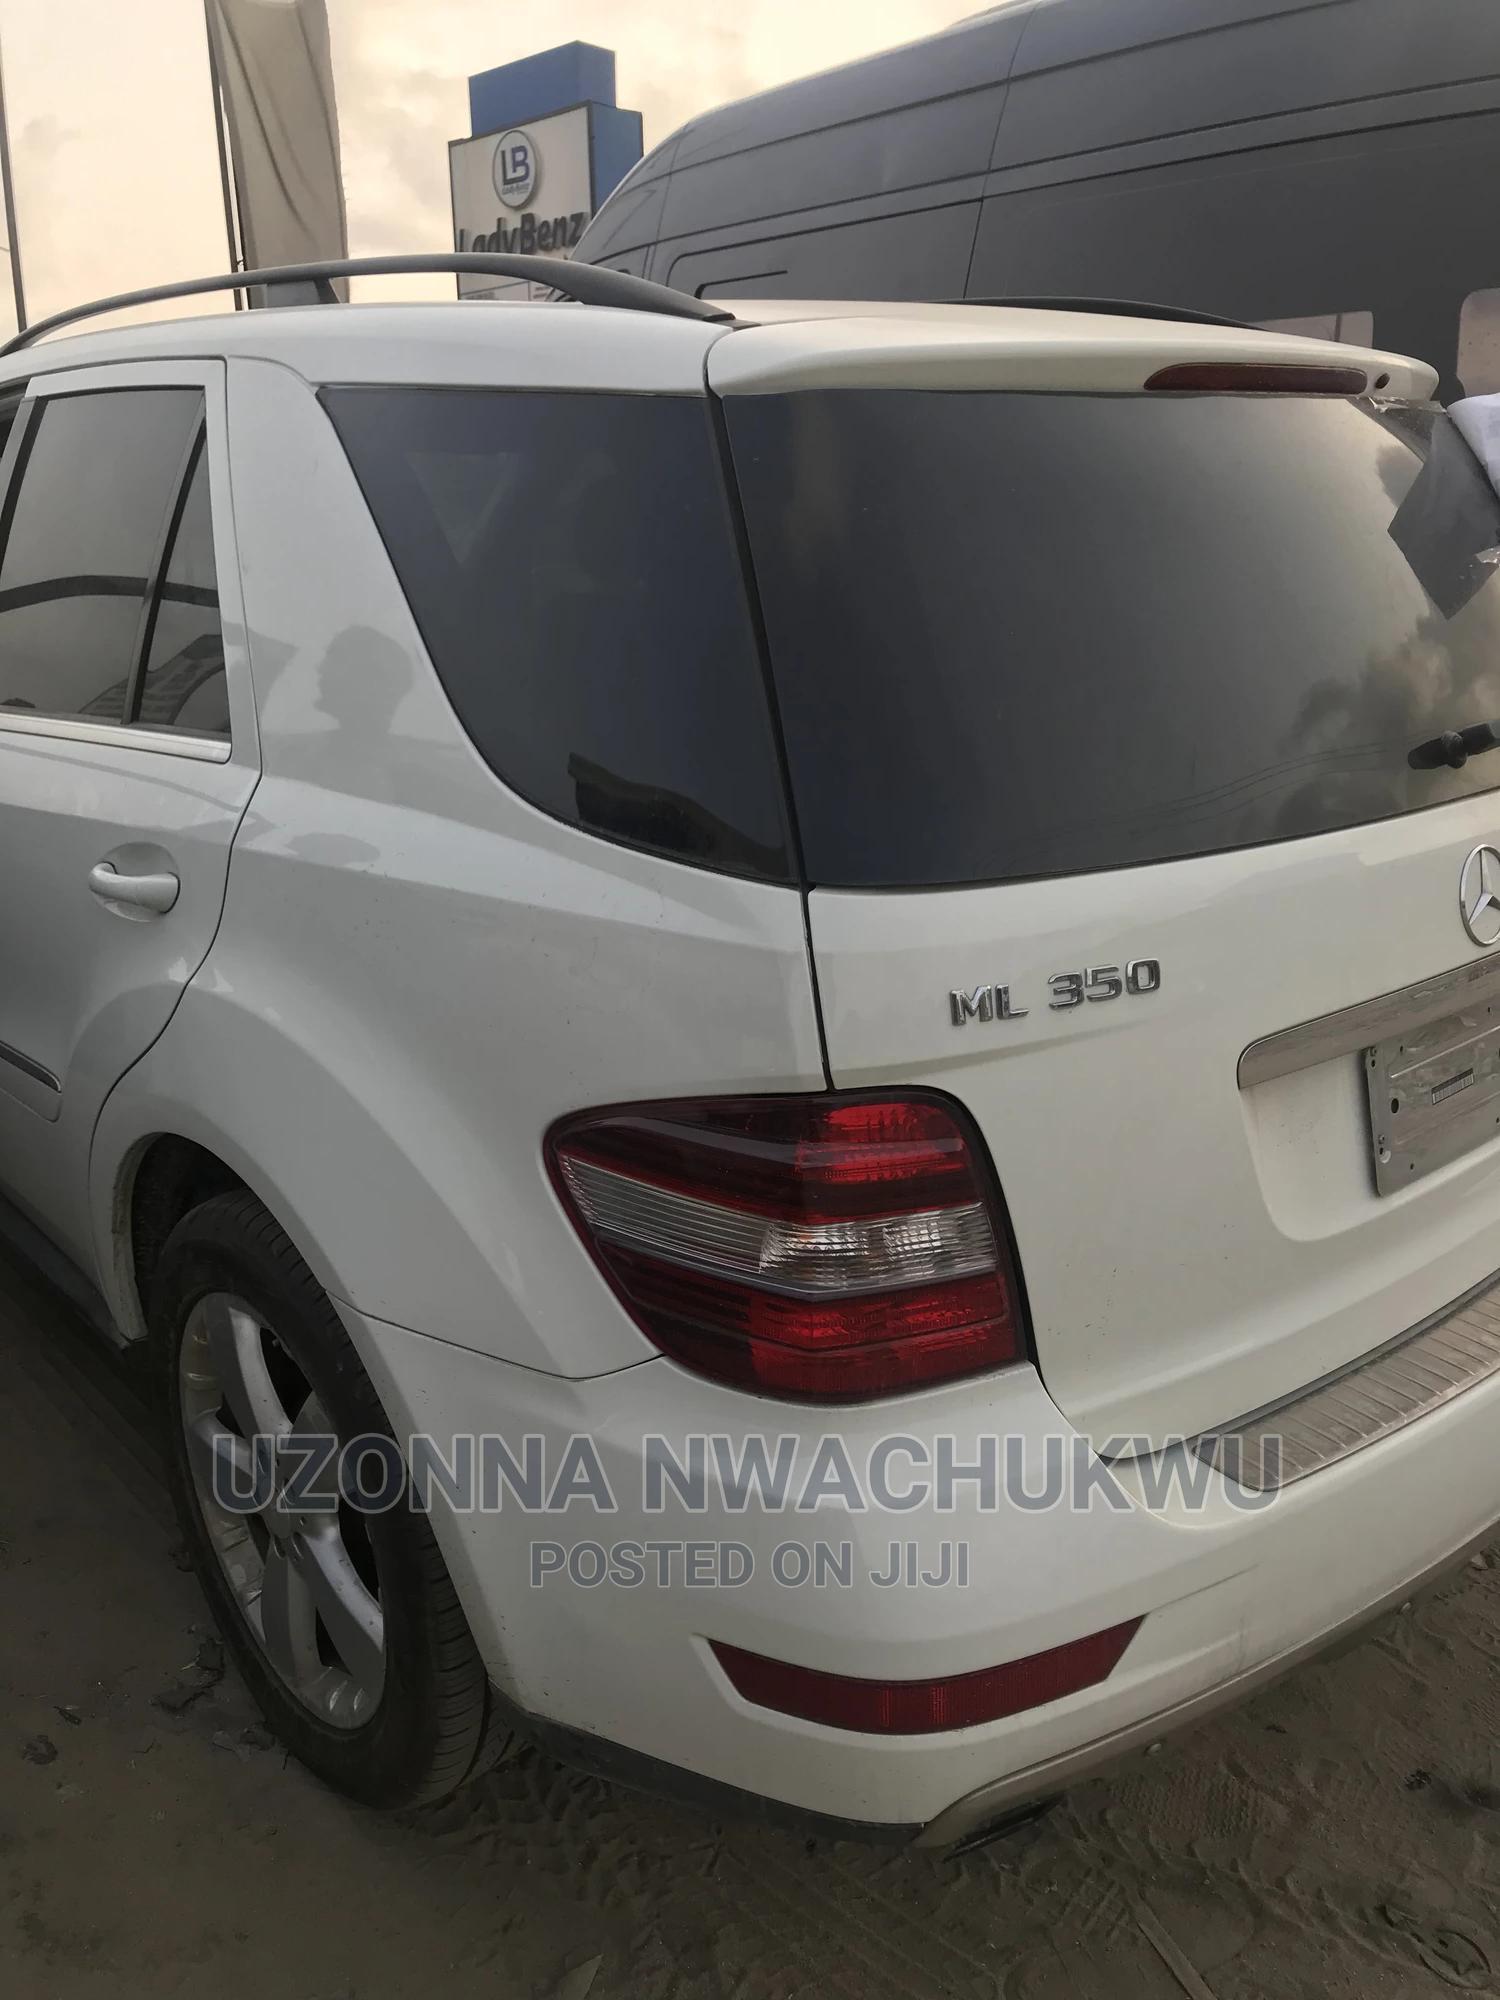 Mercedes-Benz M Class 2010 ML 350 4Matic White | Cars for sale in Ibeju, Lagos State, Nigeria